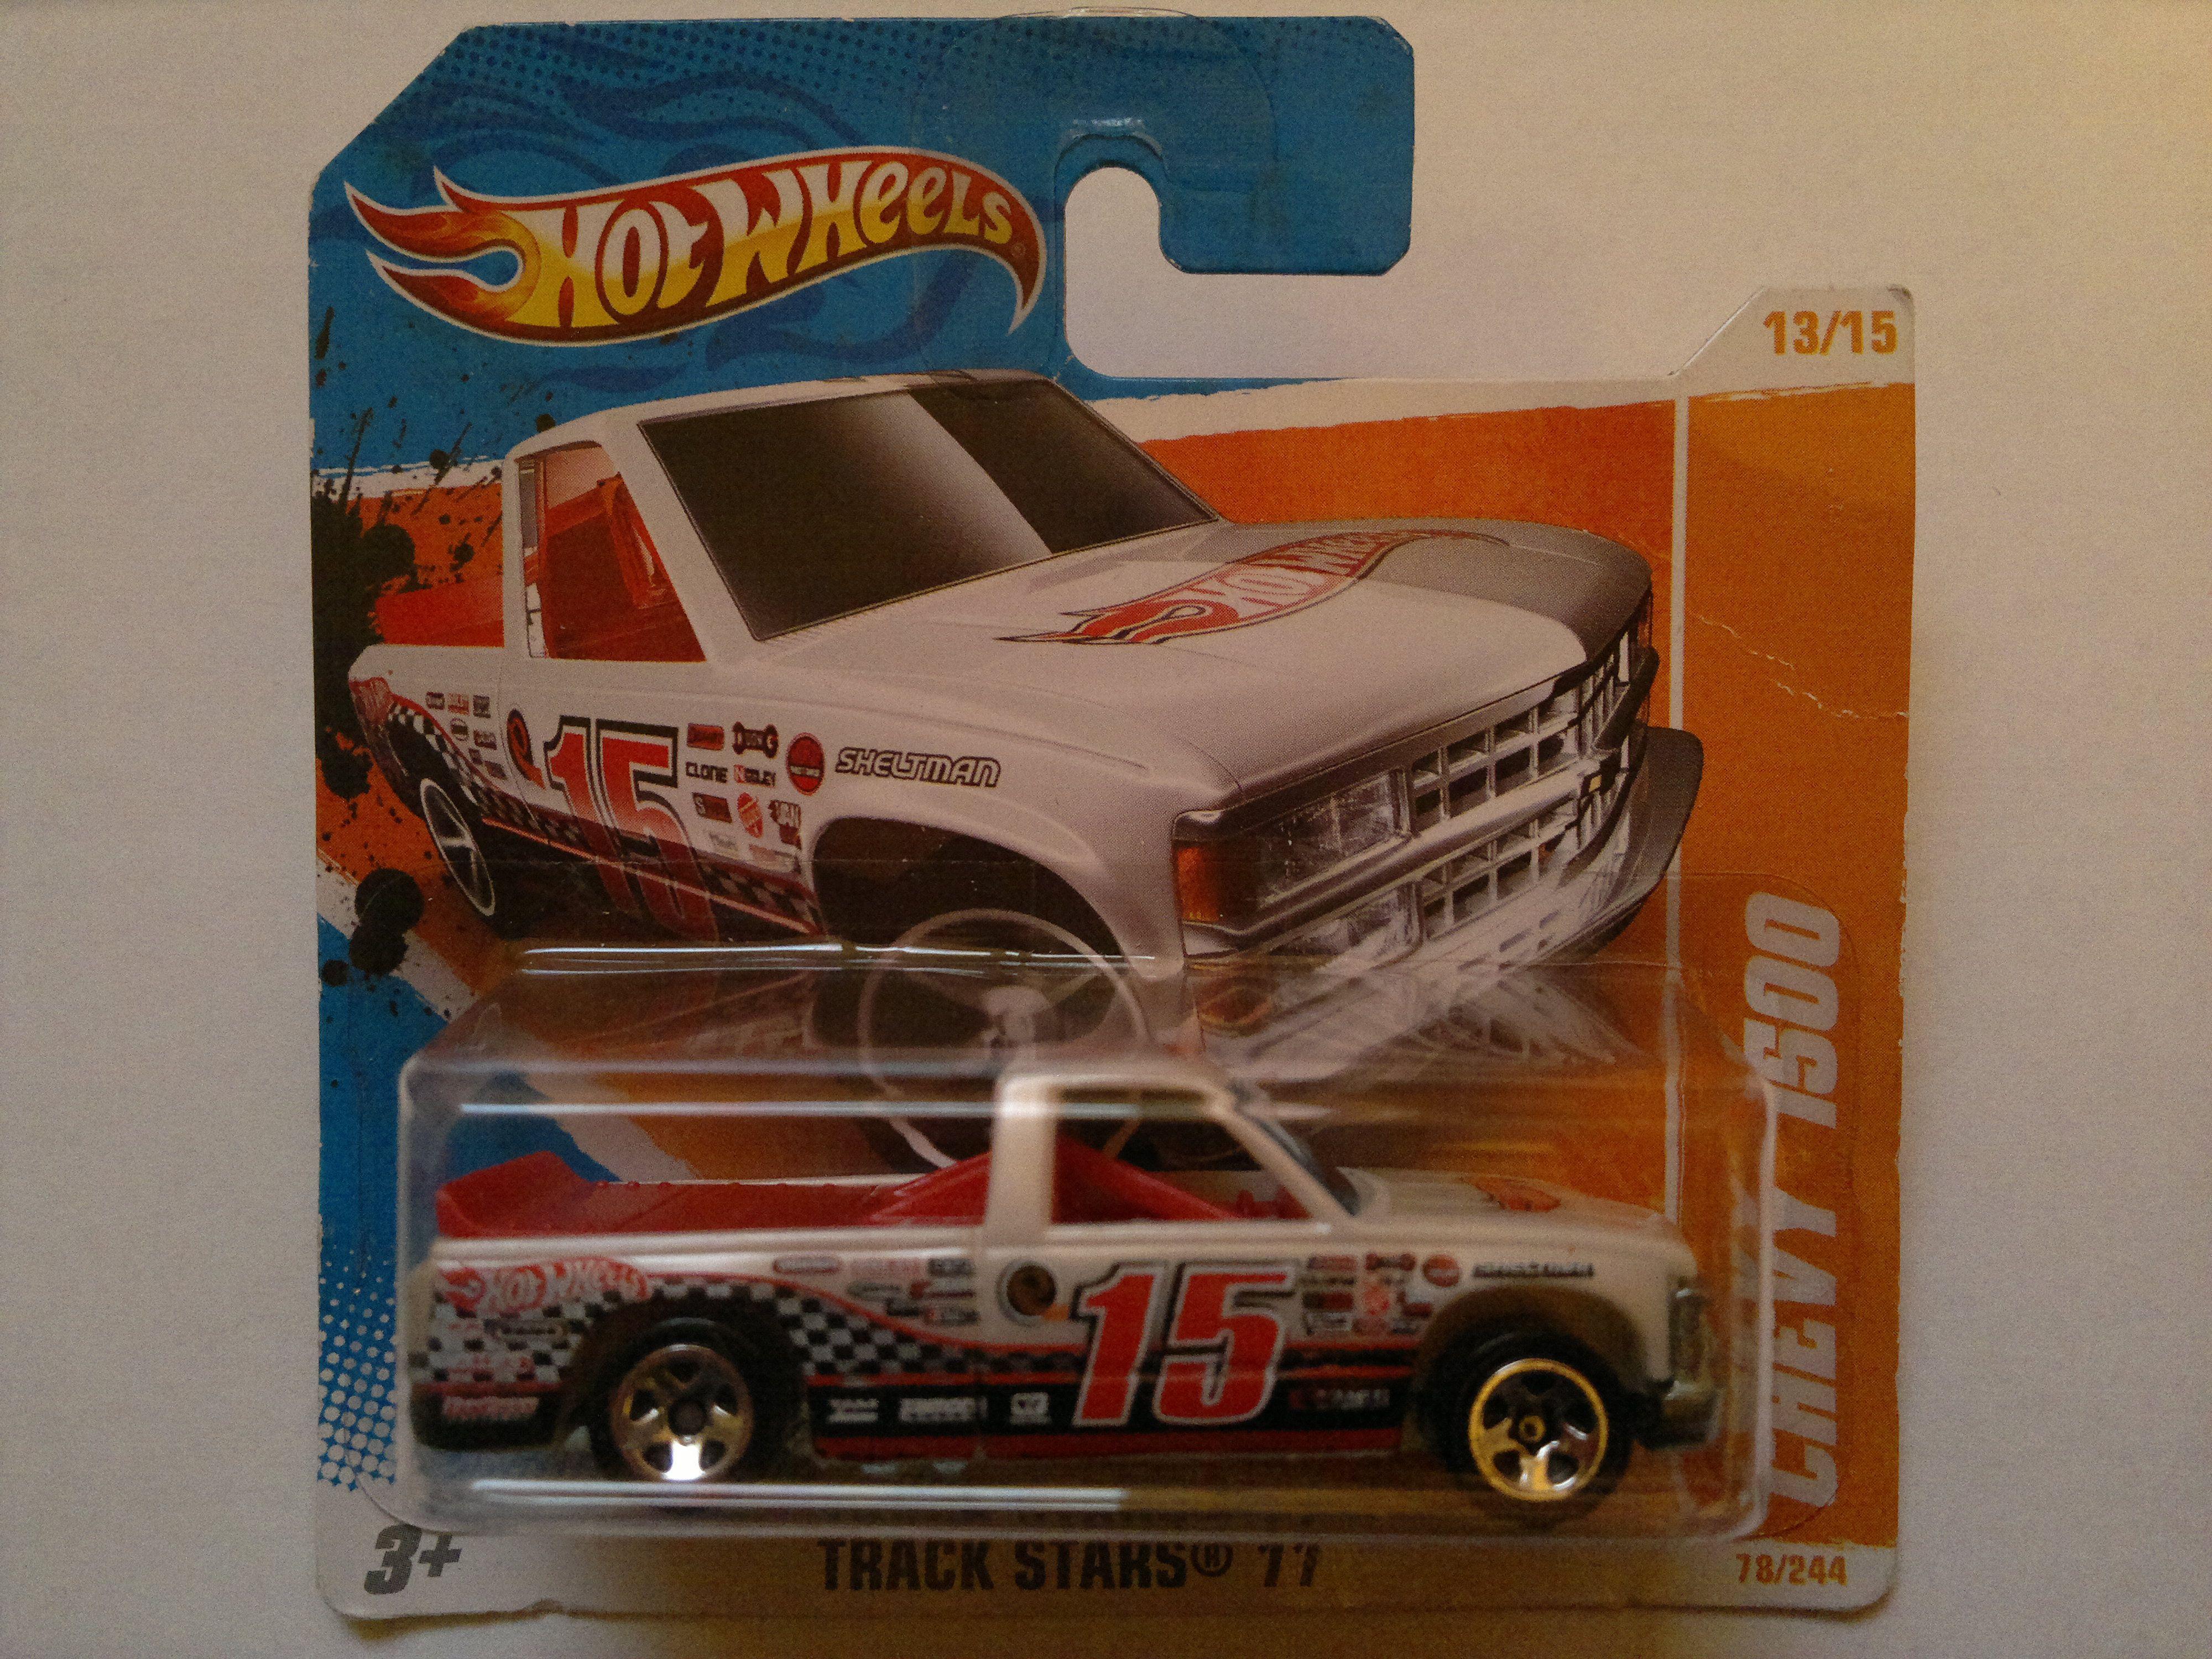 1 Hot Wheels LKW Cars Truck 25 Hot Wheels Autos Hotwheels